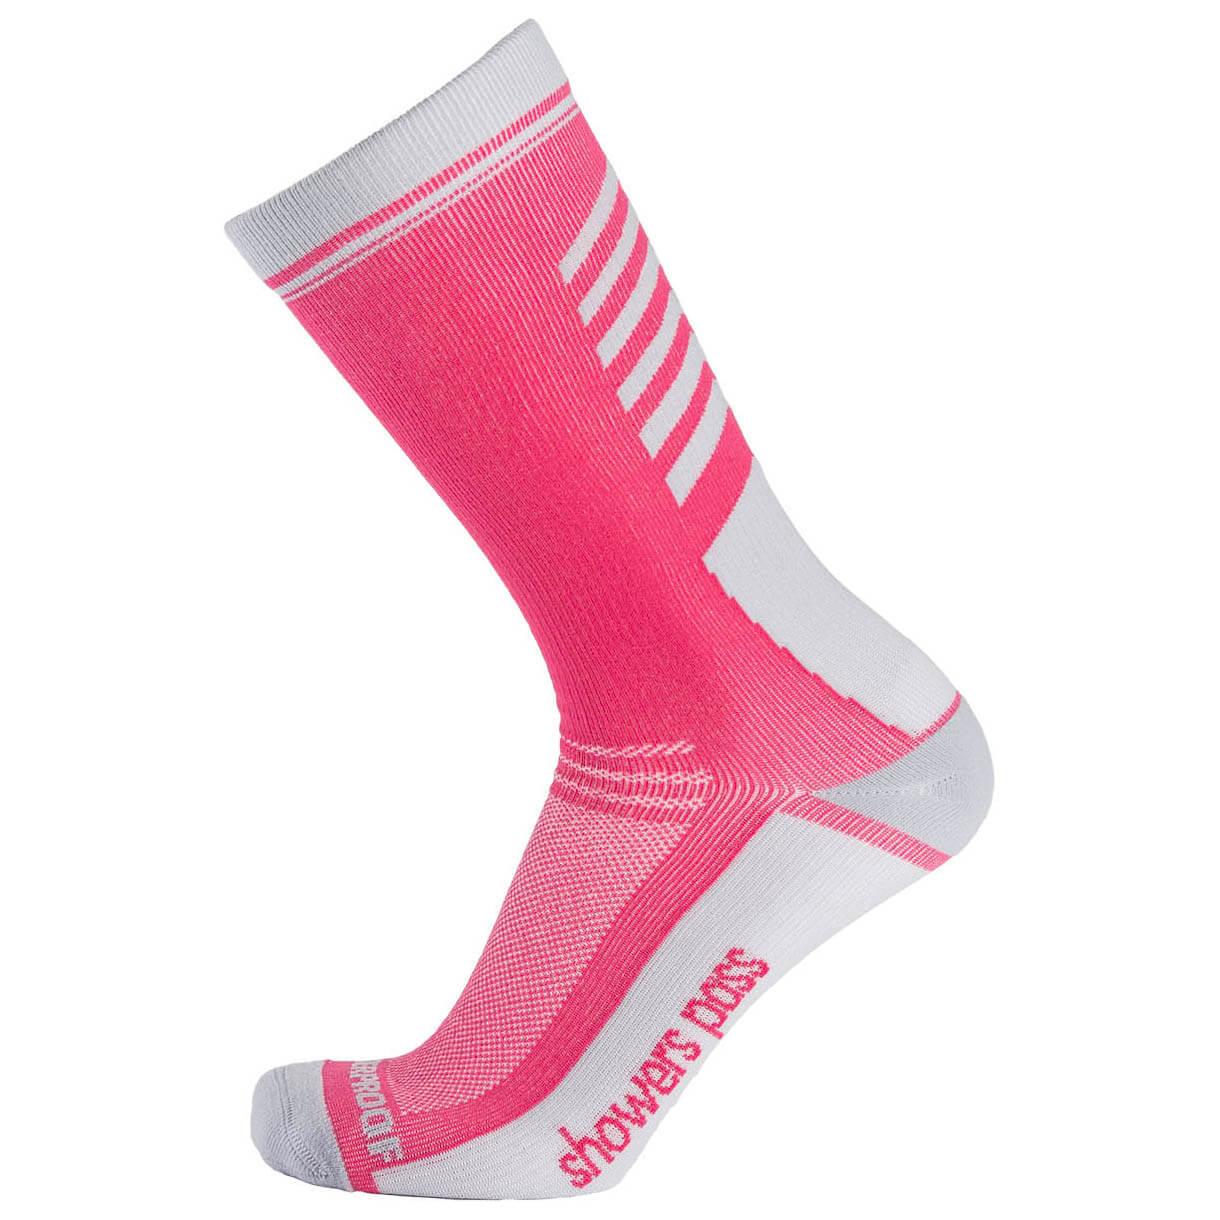 Showers Pass - Crosspoint Lightweight Waterproof Socks Pink